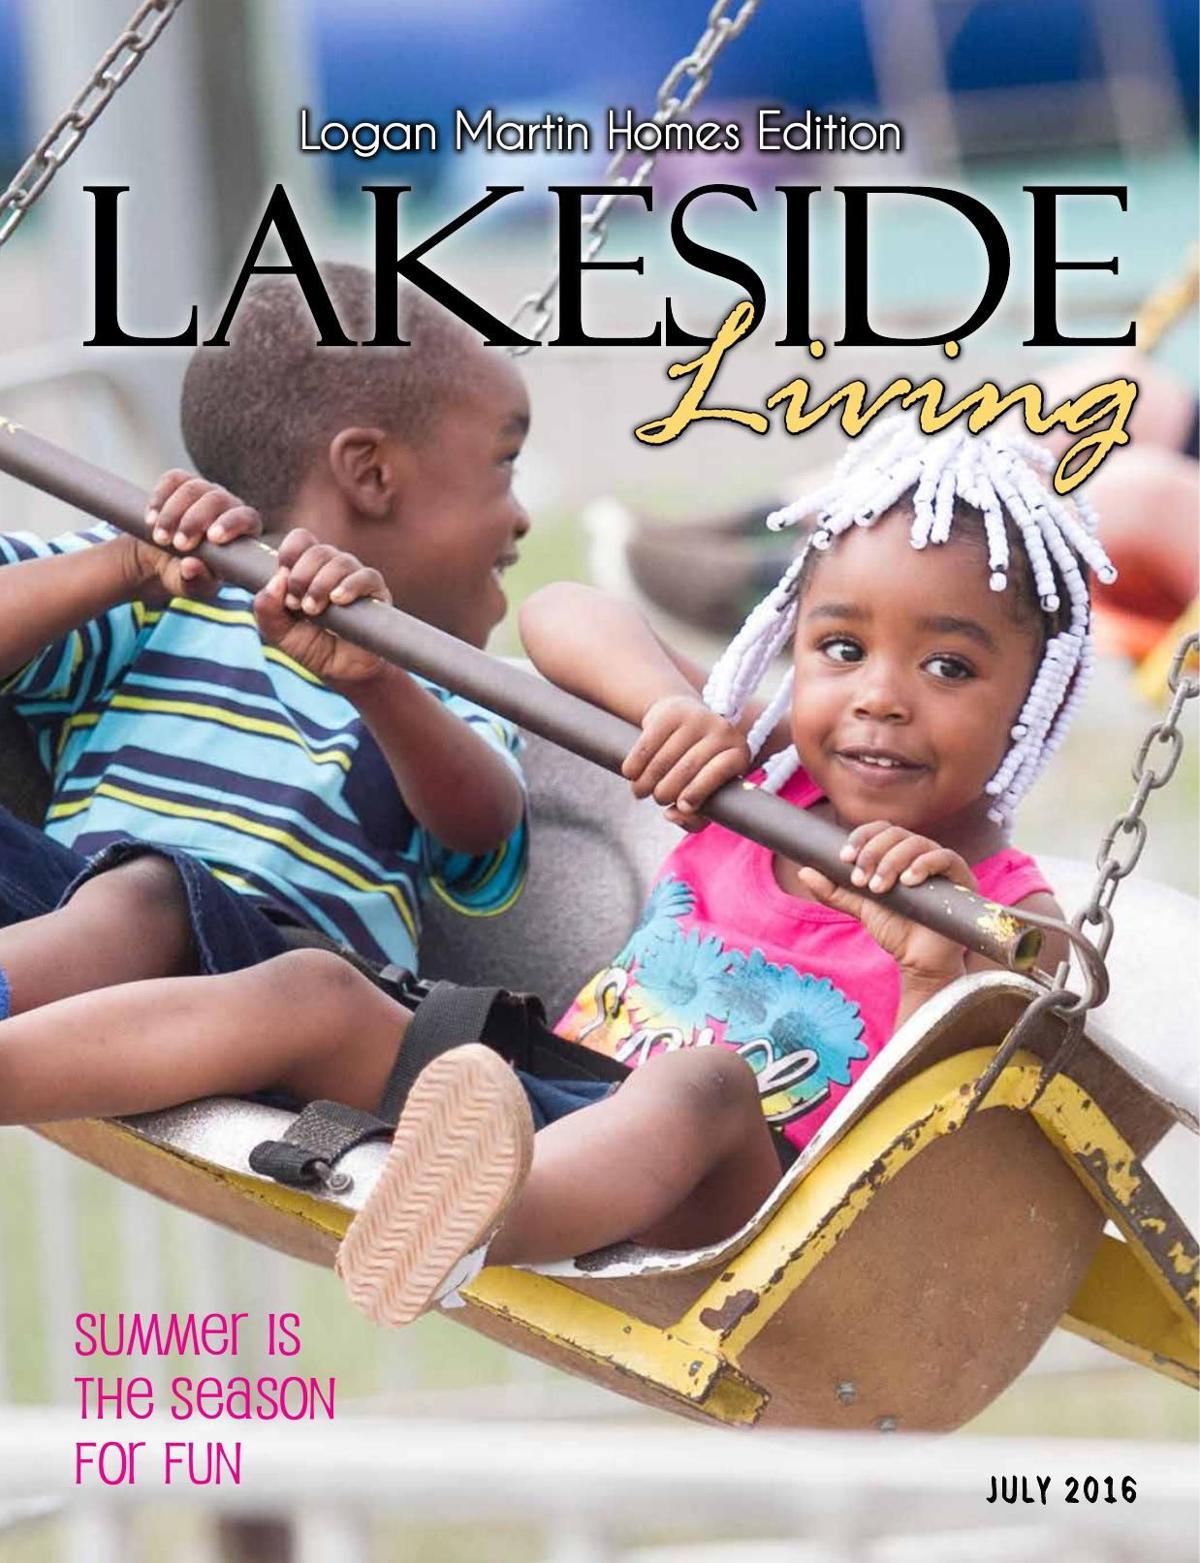 Lakeside - July 2016